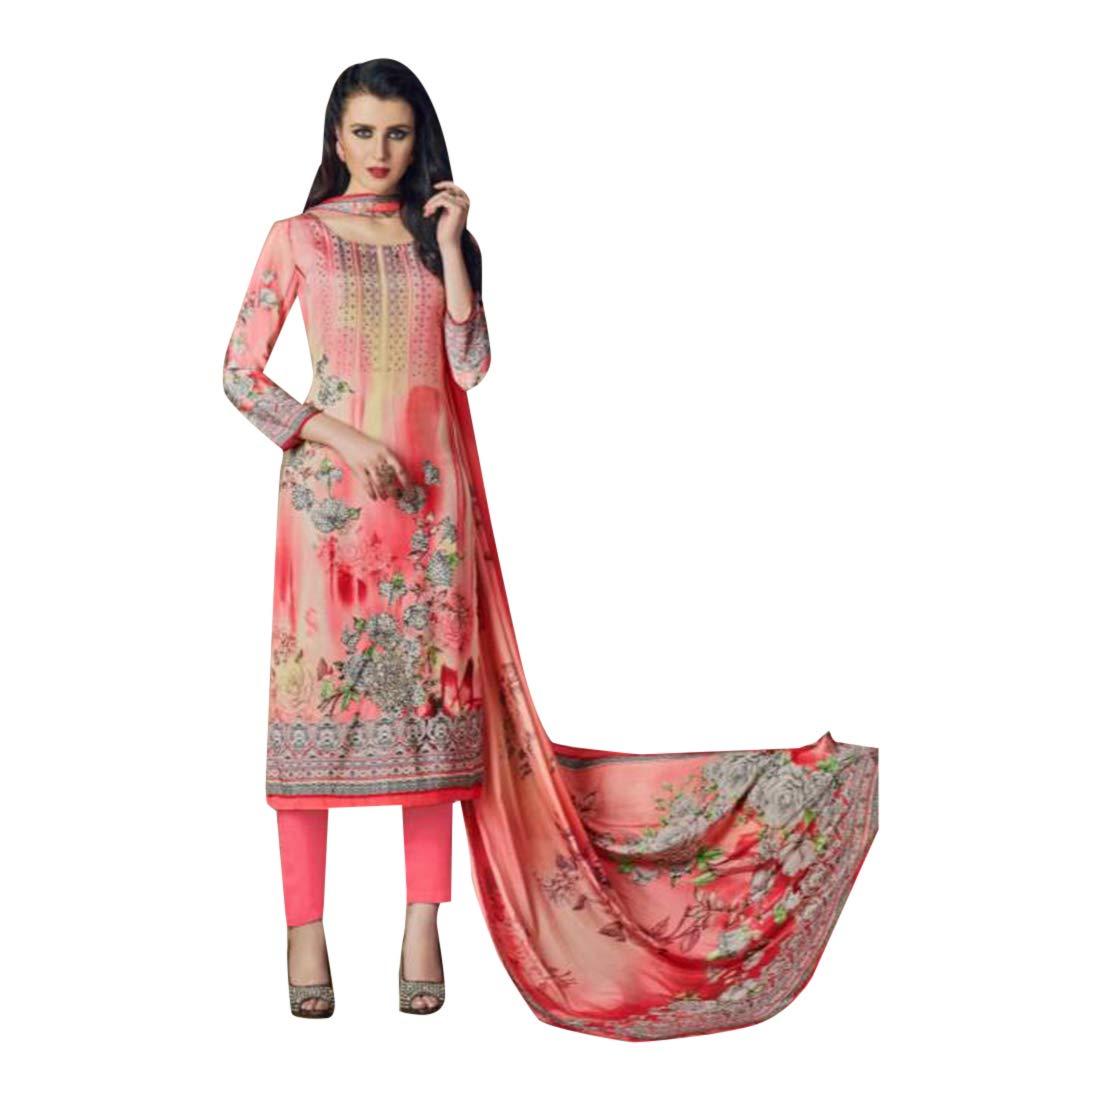 Fashionable Digital Printed crape Straignt Salwar kameez fancy stone work Casual wear 7120 8